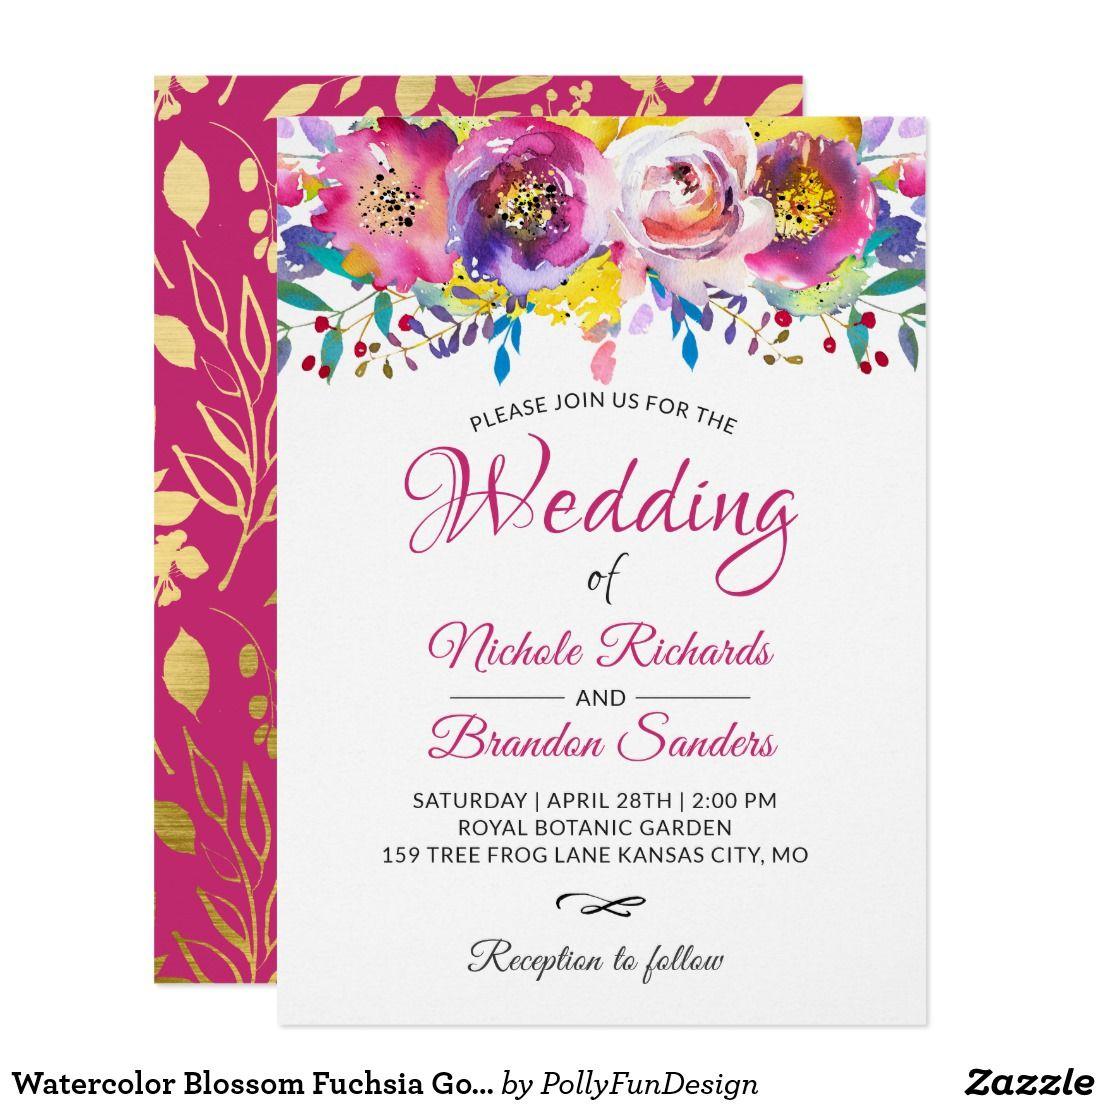 Watercolor Blossom Fuchsia Gold Floral Wedding Card   Floral wedding ...